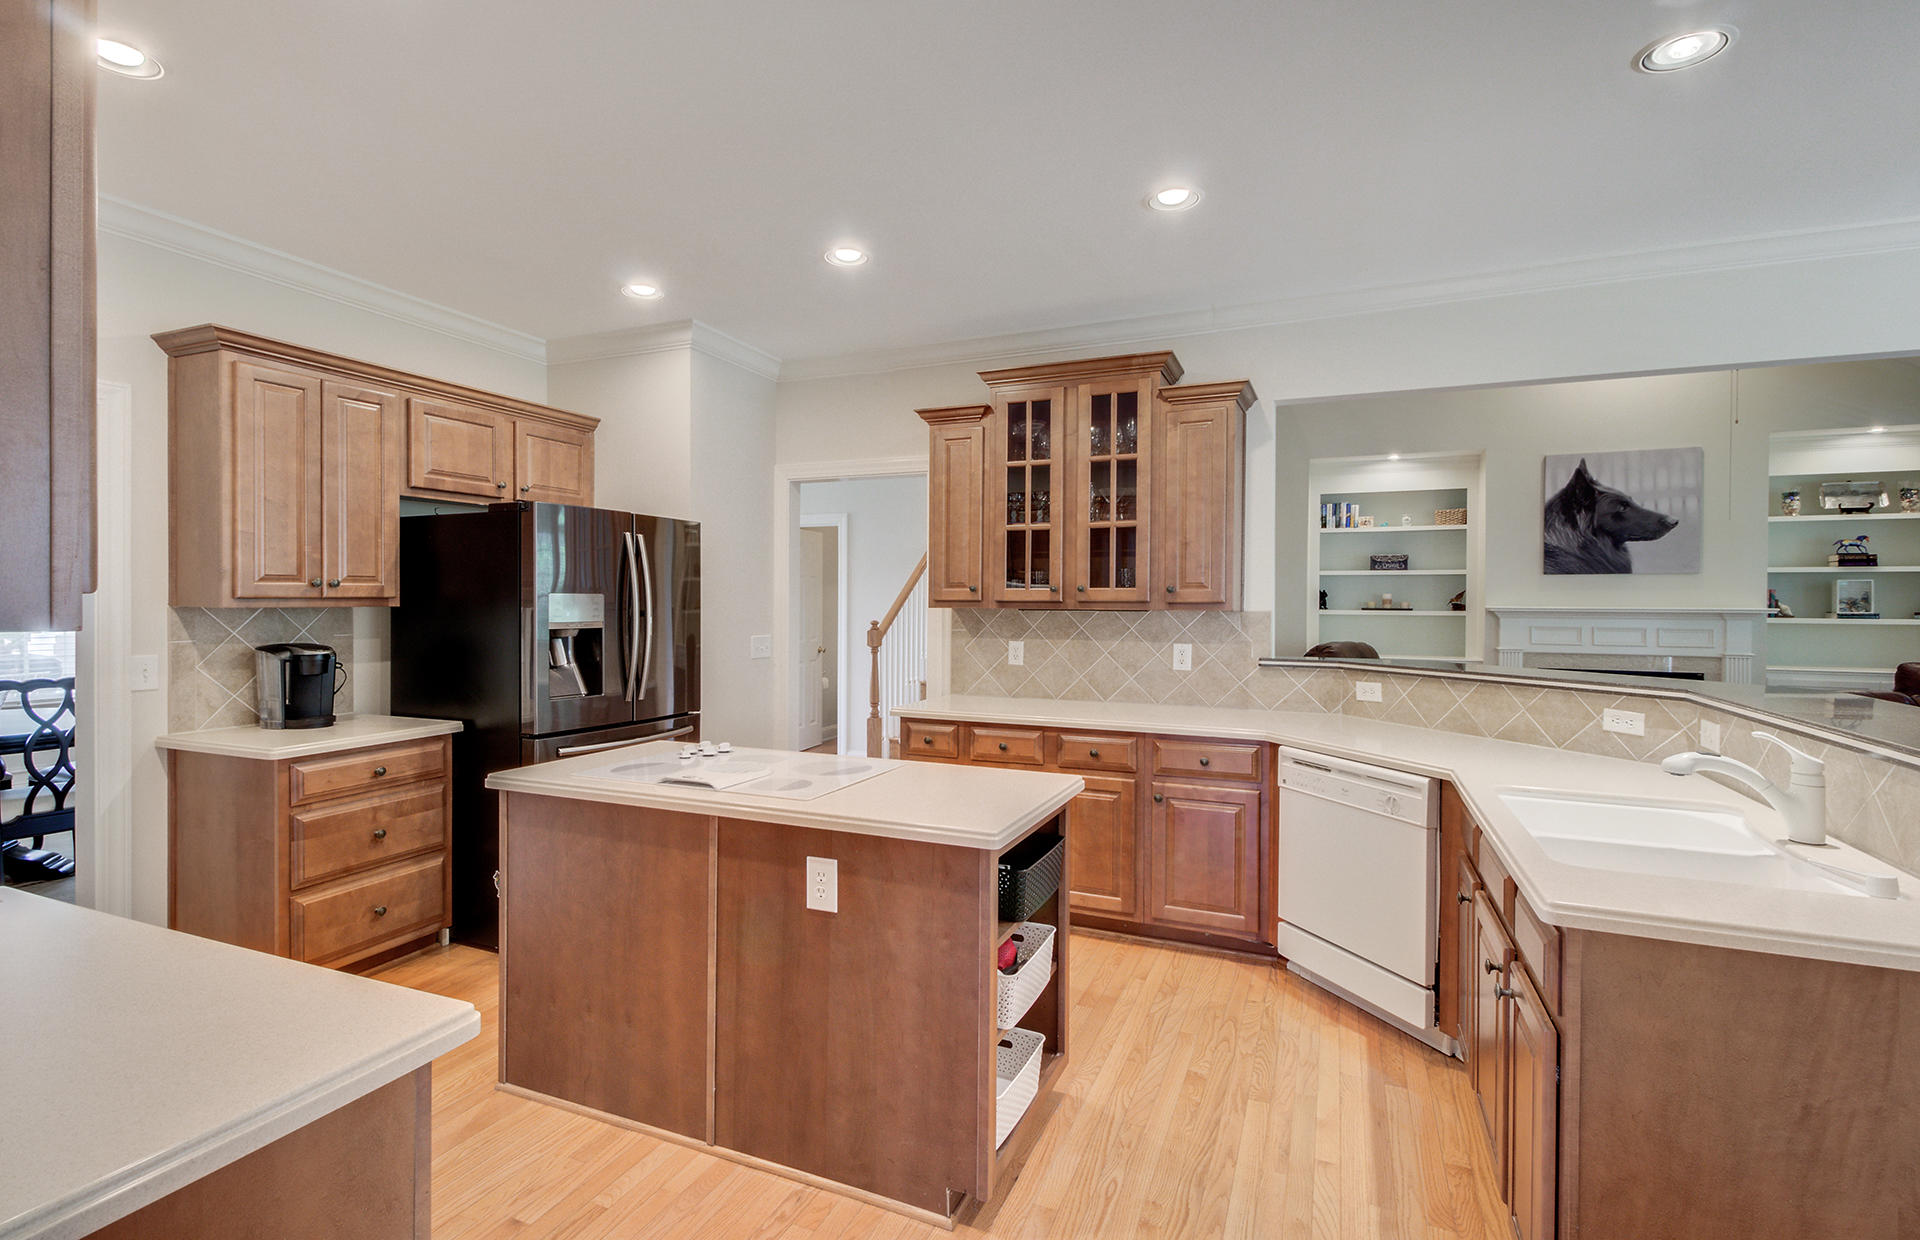 Dunes West Homes For Sale - 2453 Darts Cove, Mount Pleasant, SC - 25